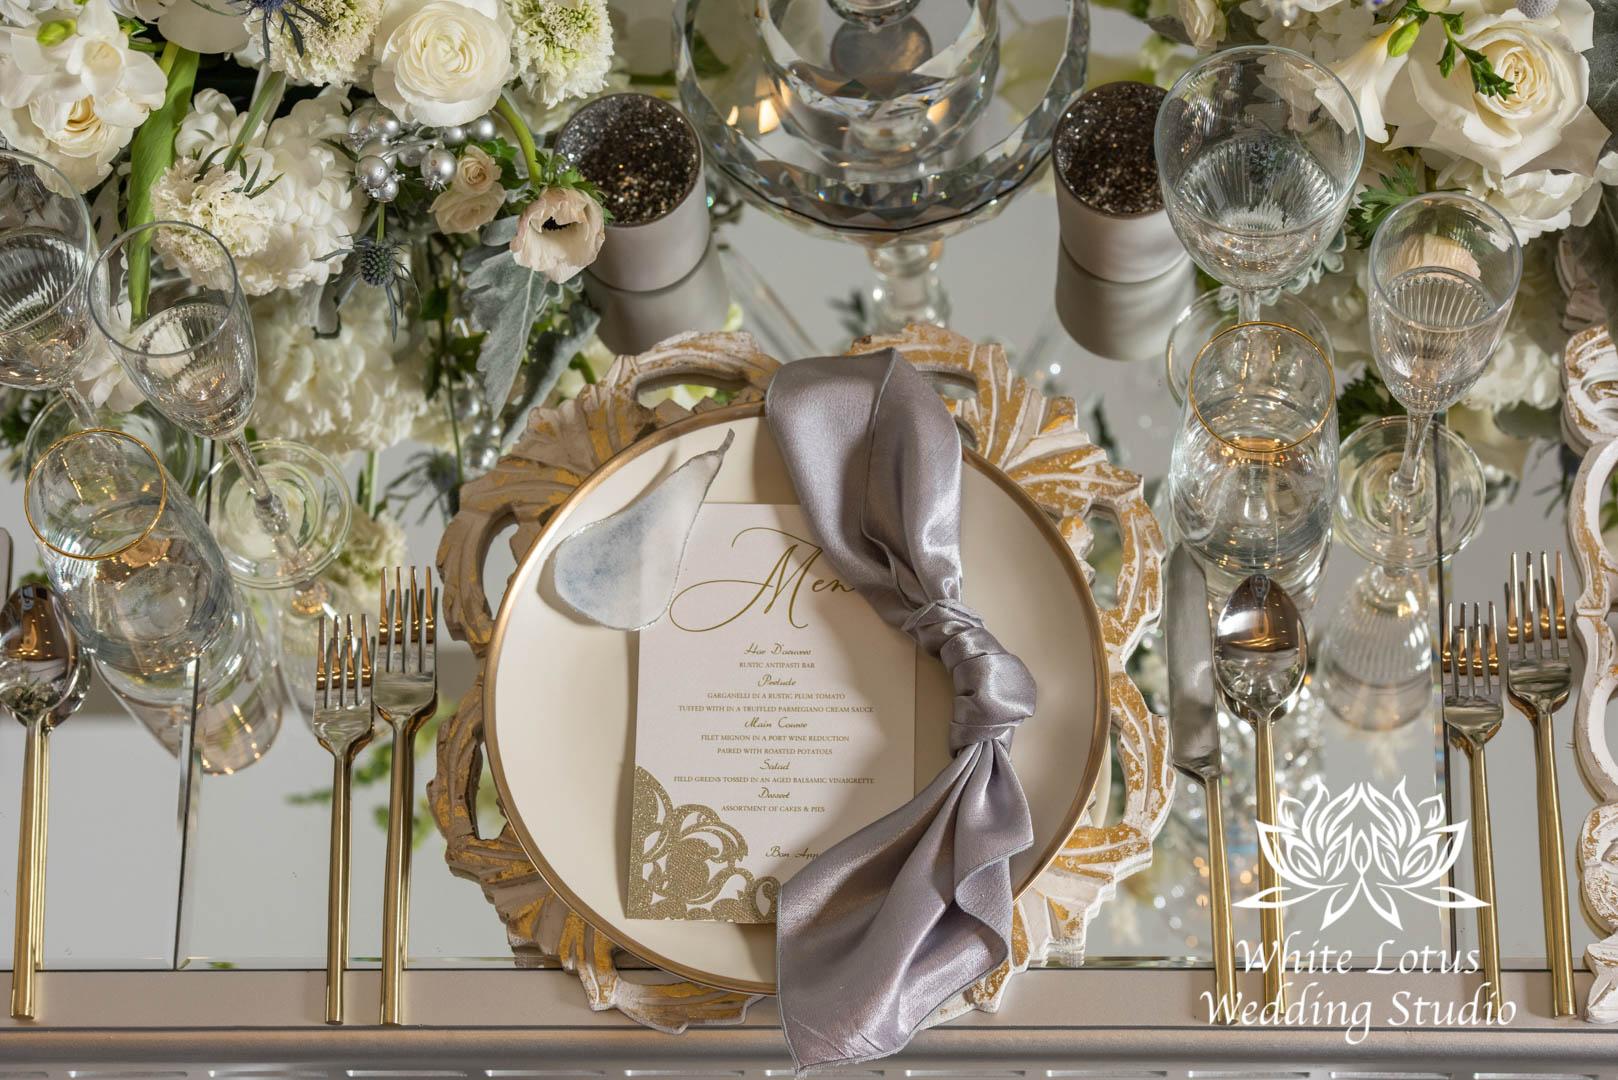 165- GLAM WINTERLUXE WEDDING INSPIRATION